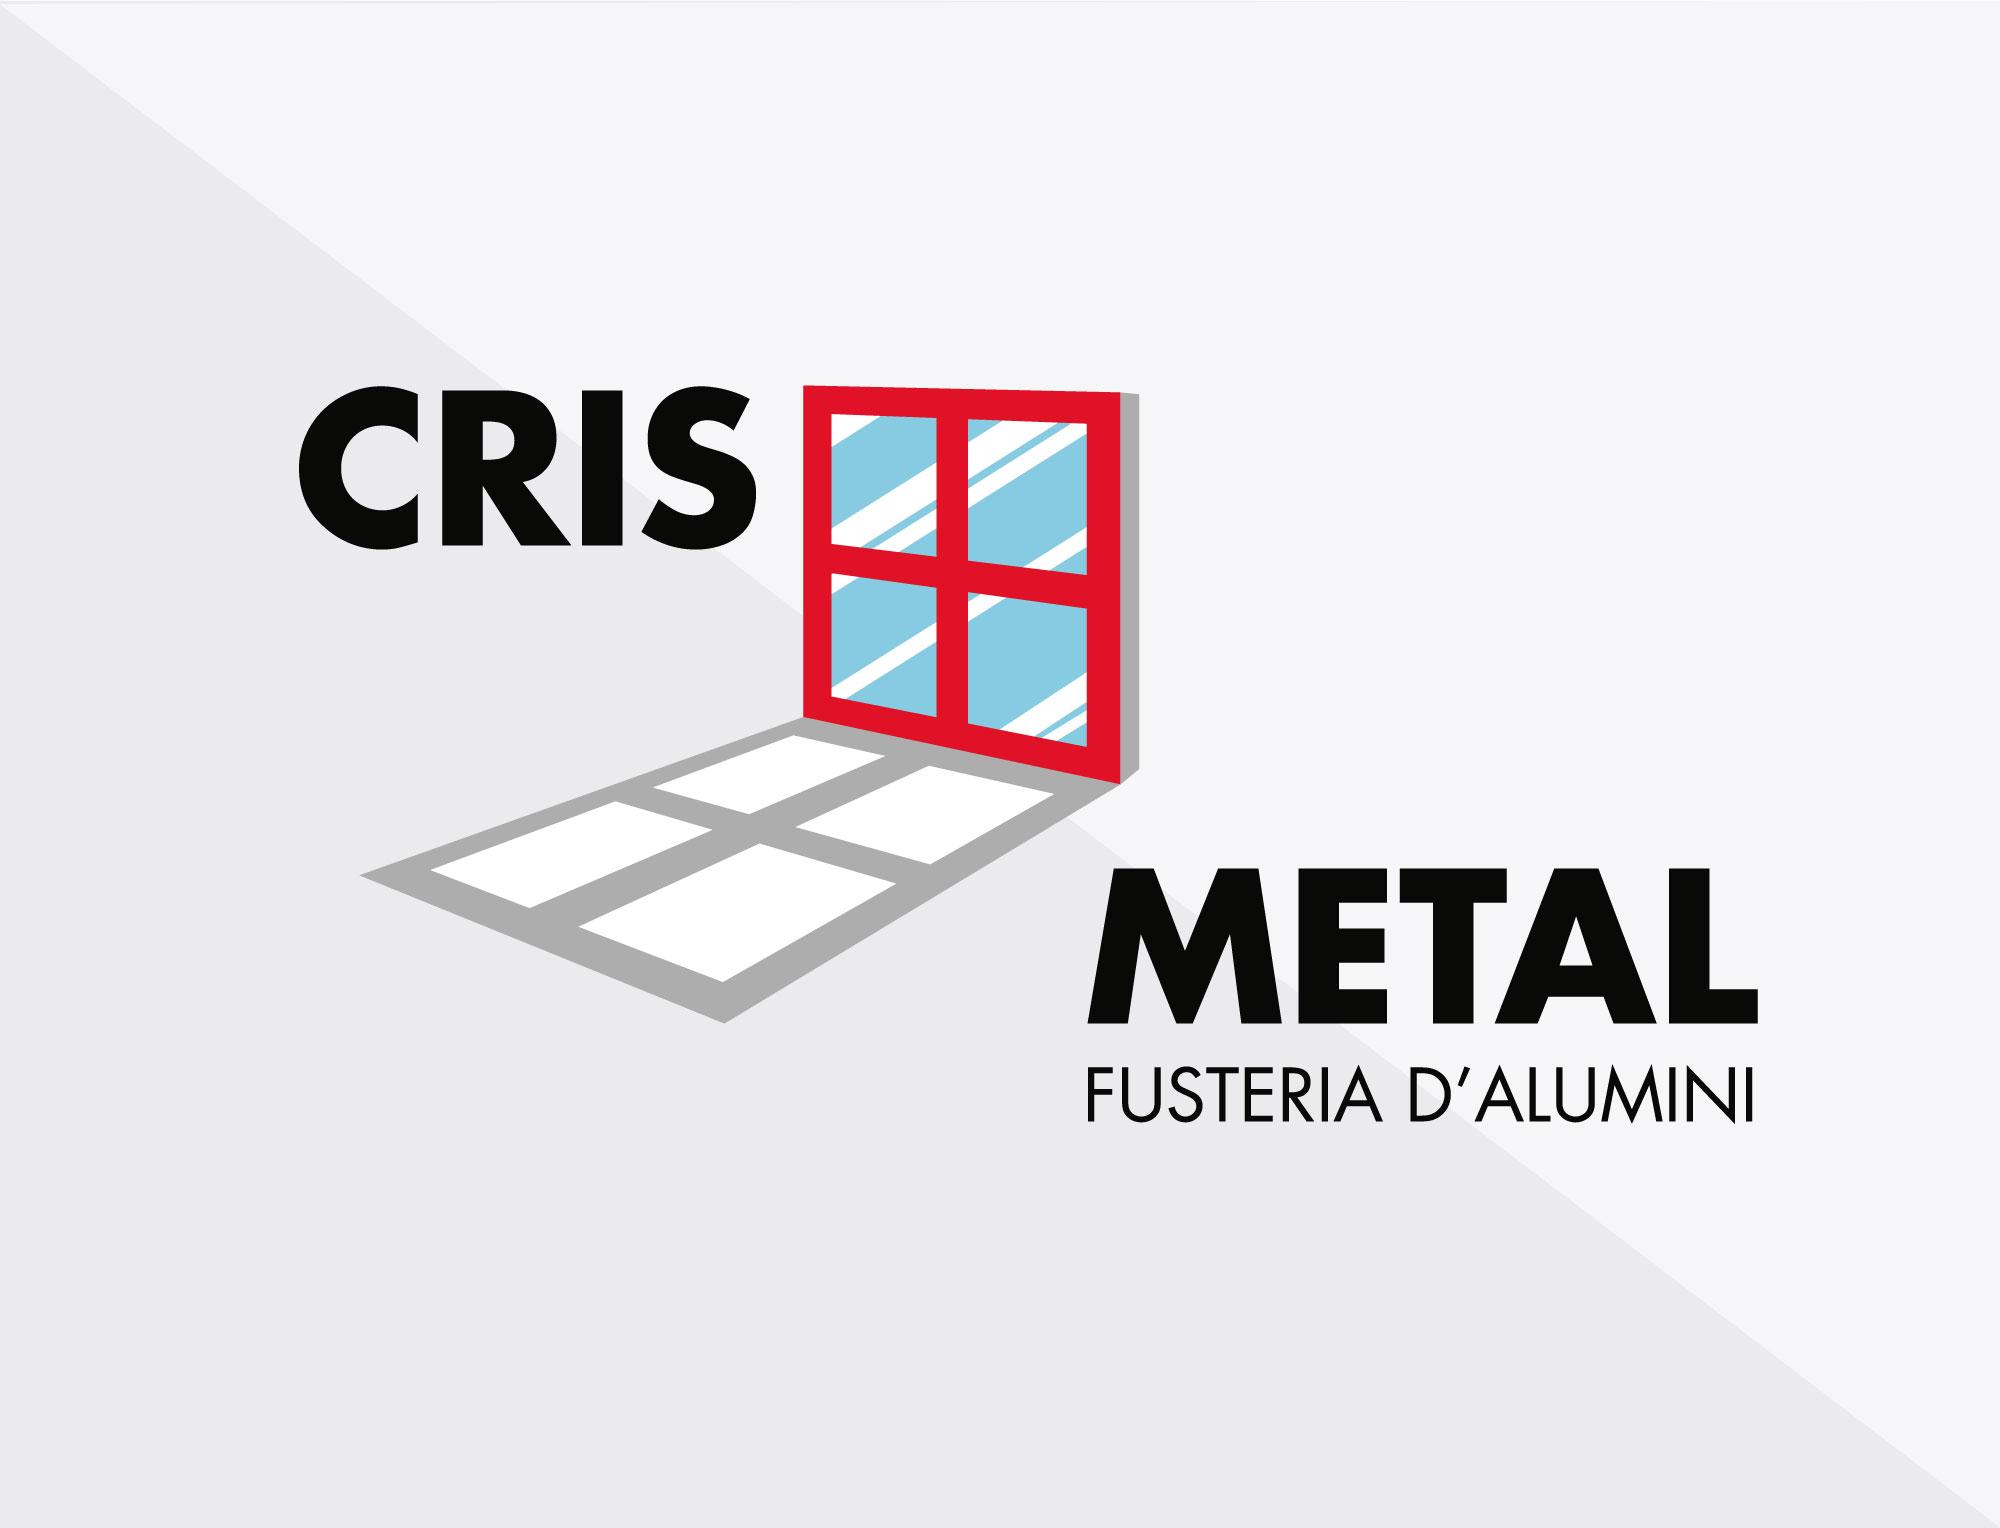 Redisseny de logotip. Disseny gràfic. Logotip Cris Metal